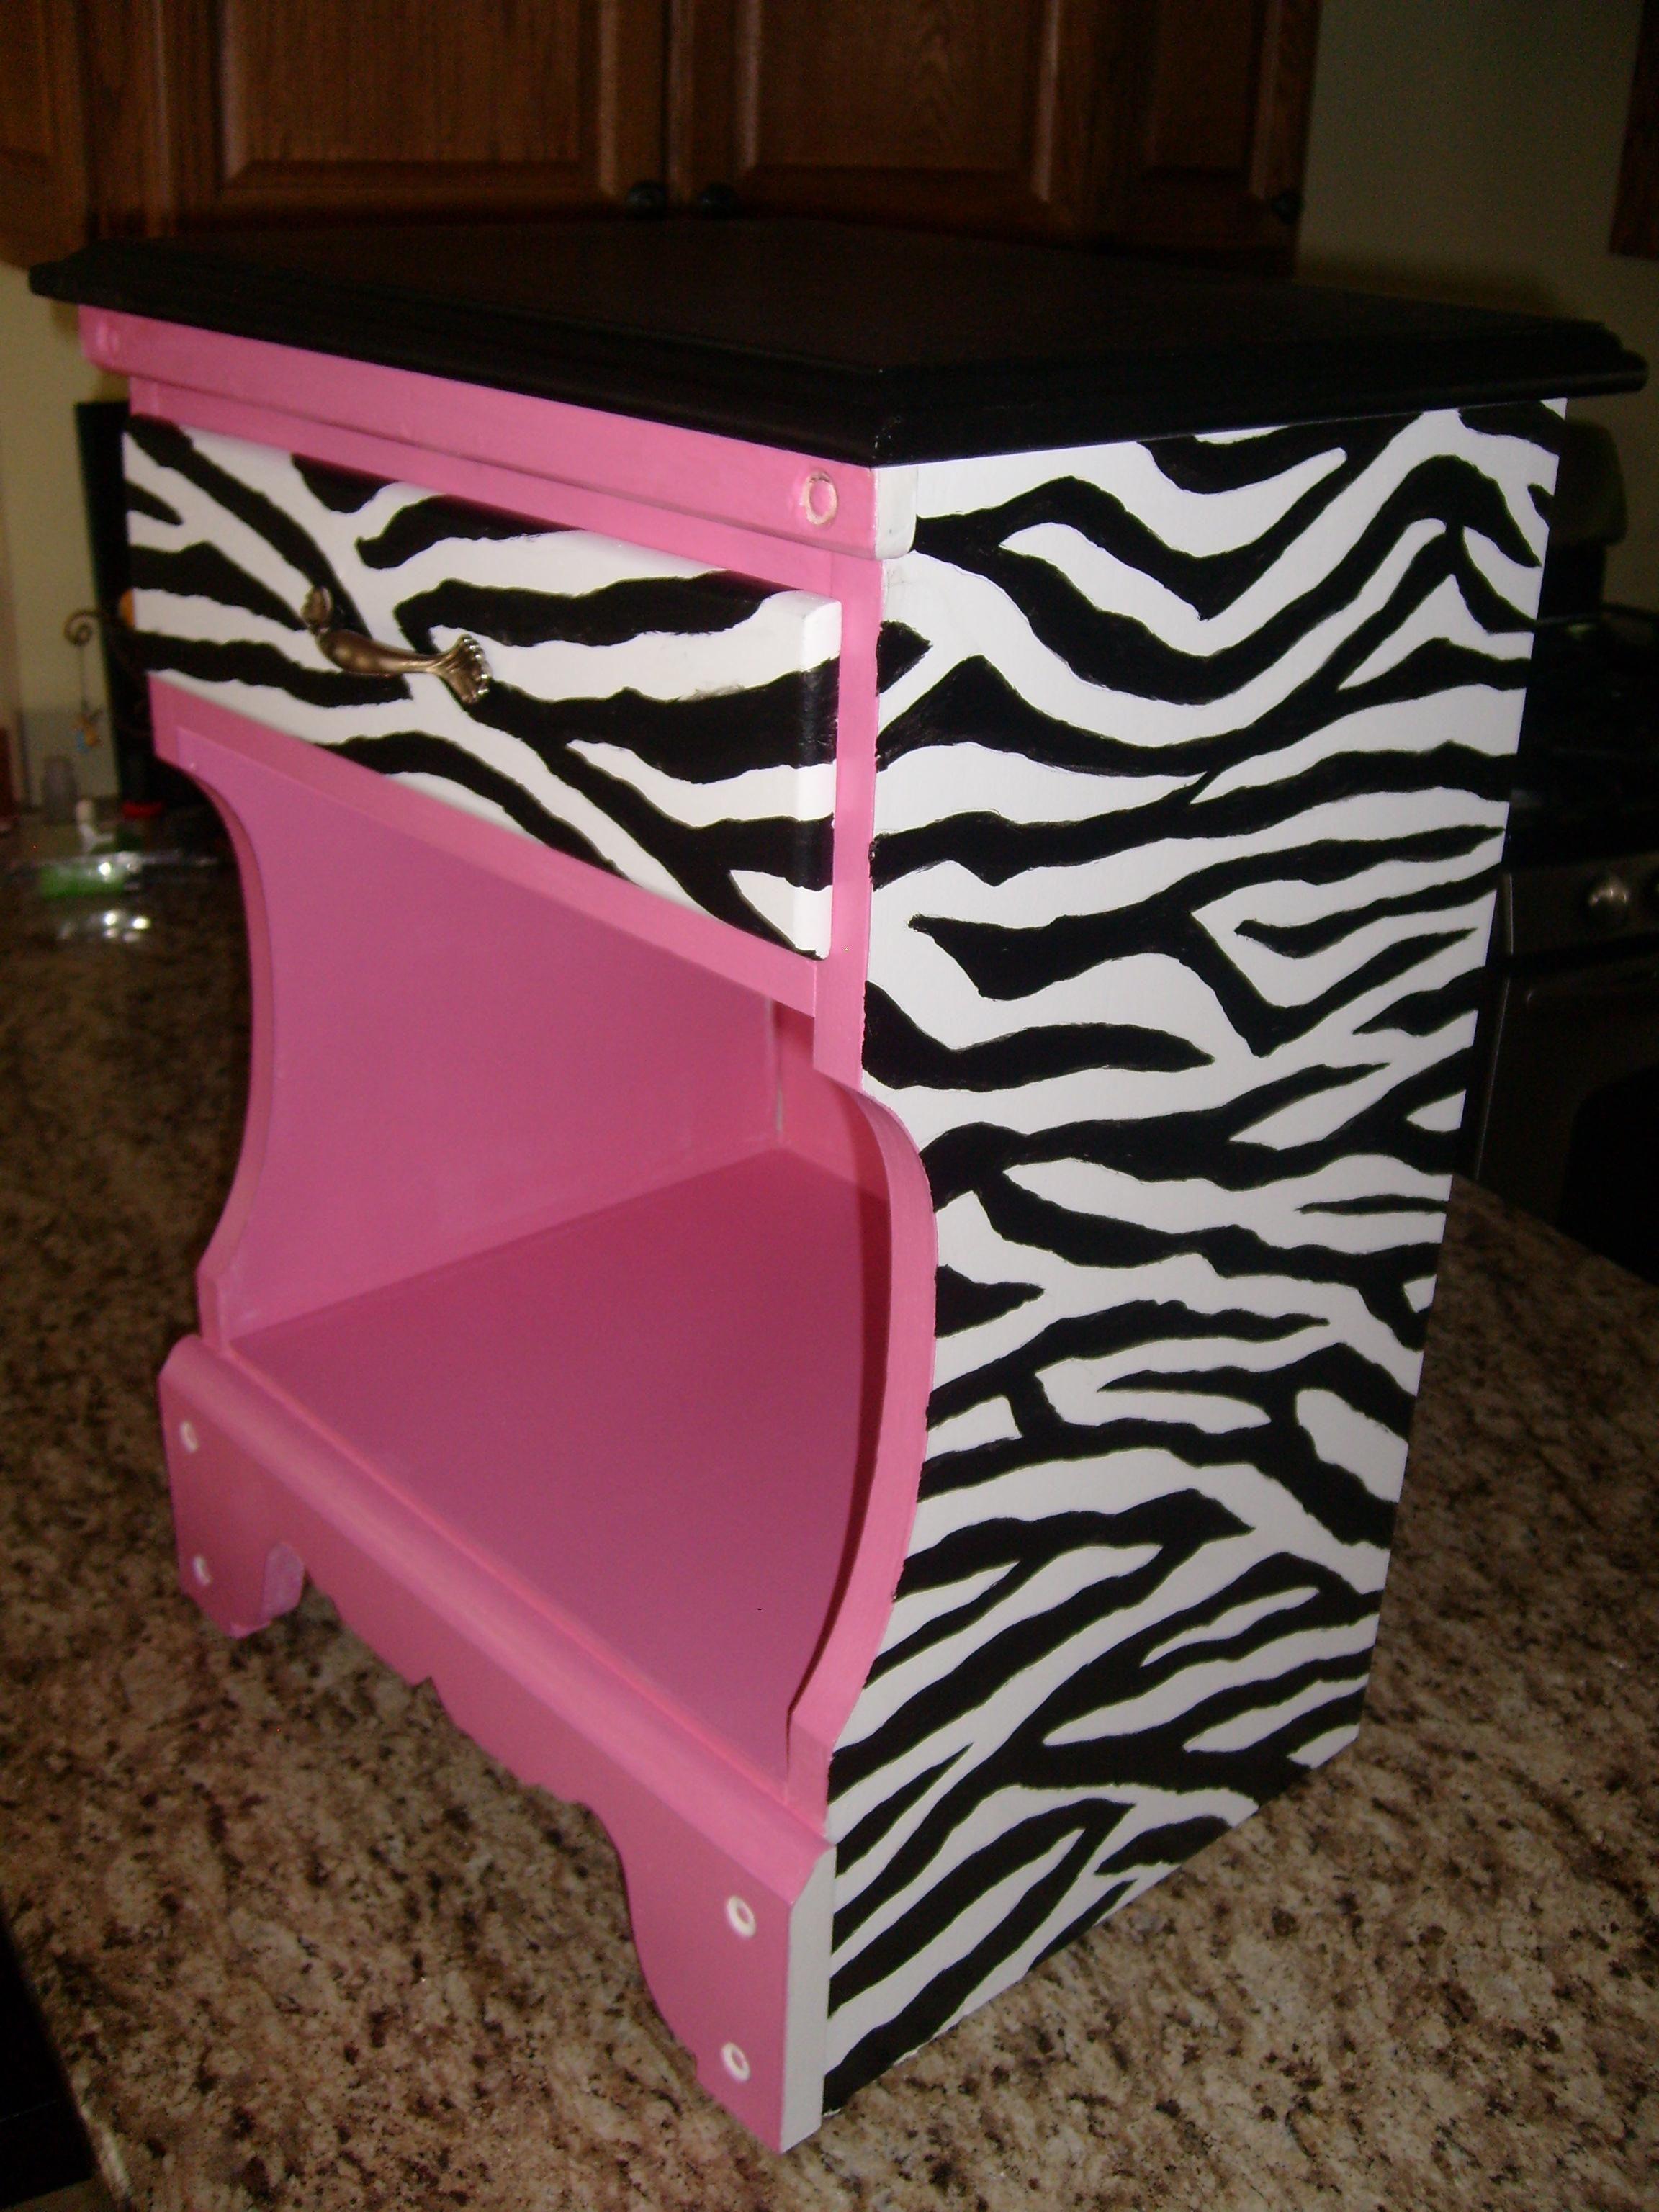 My granddaughter likes zebra print u pink so i repainted her